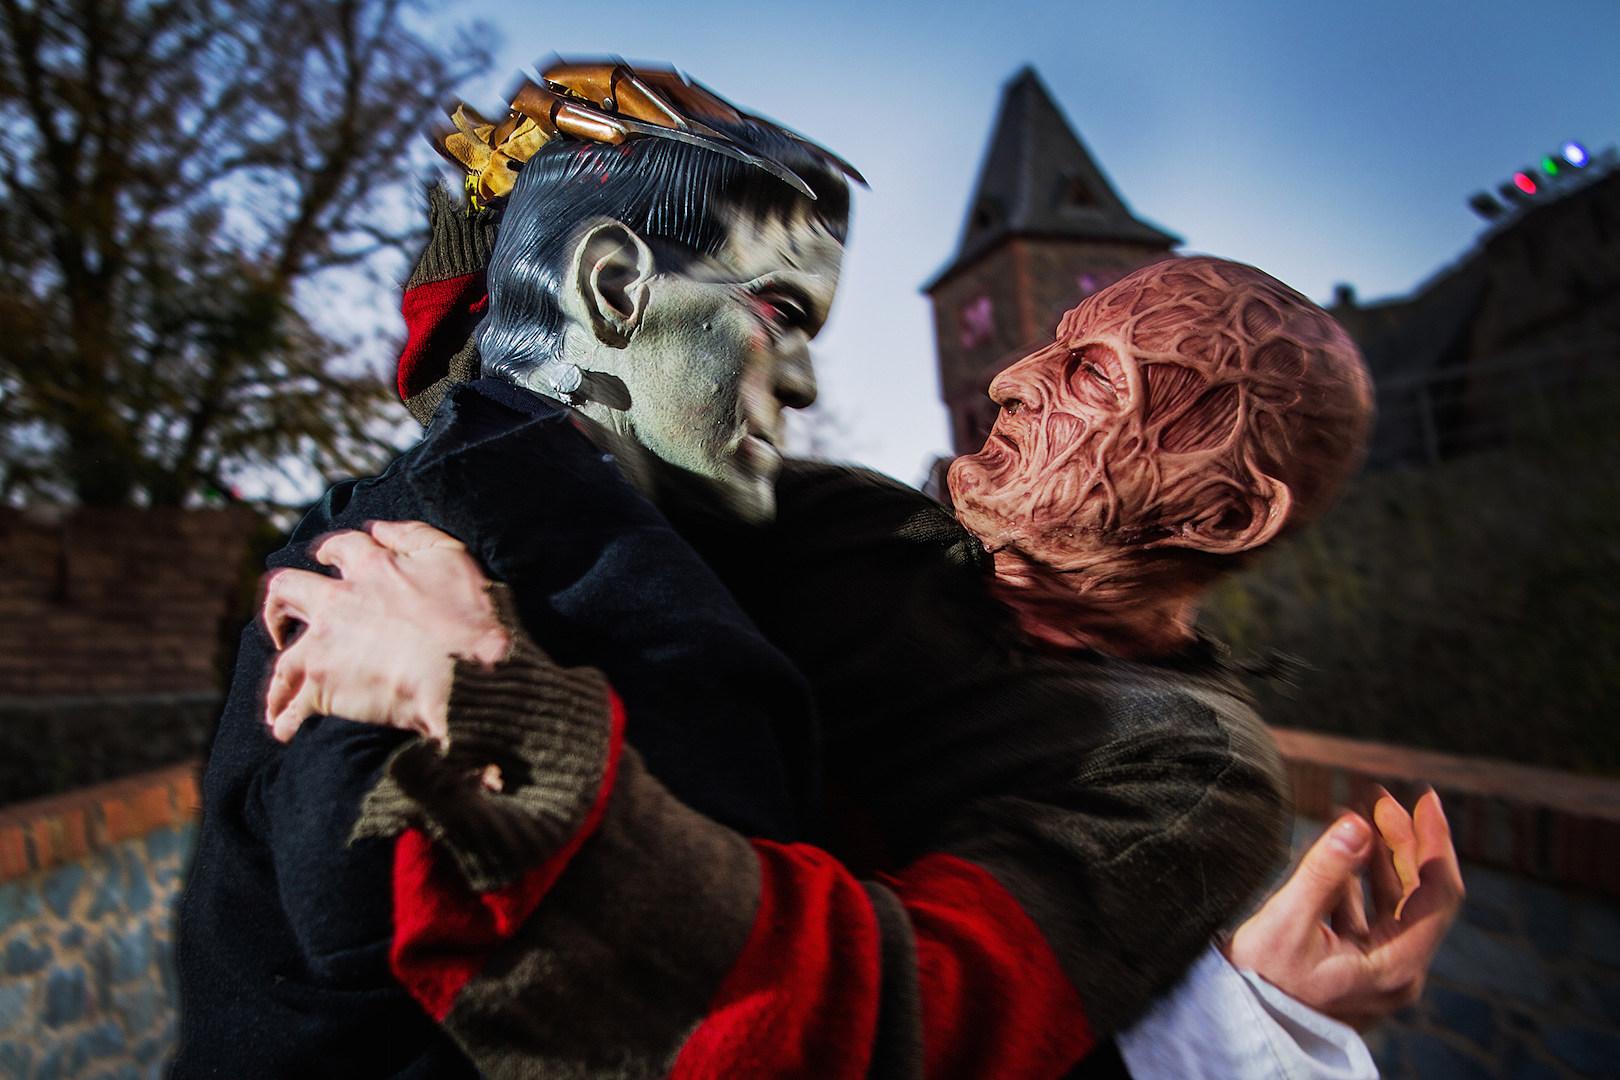 12 Heavy Metal Horror Movie Soundtracks That Totally Slay